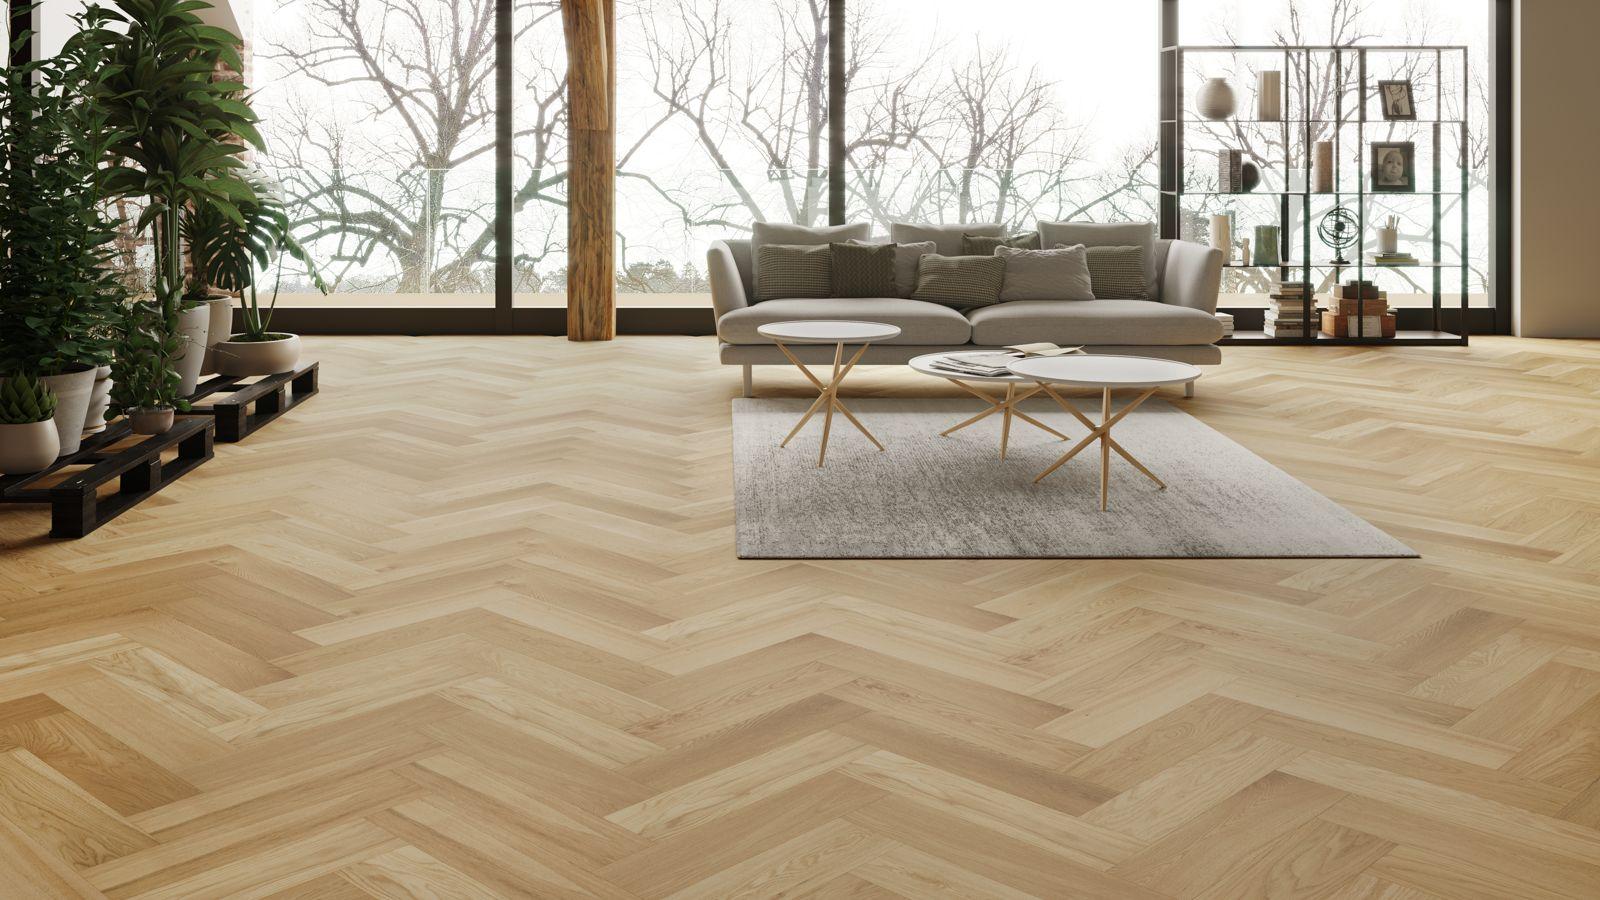 jenis desain lantai parket kayu